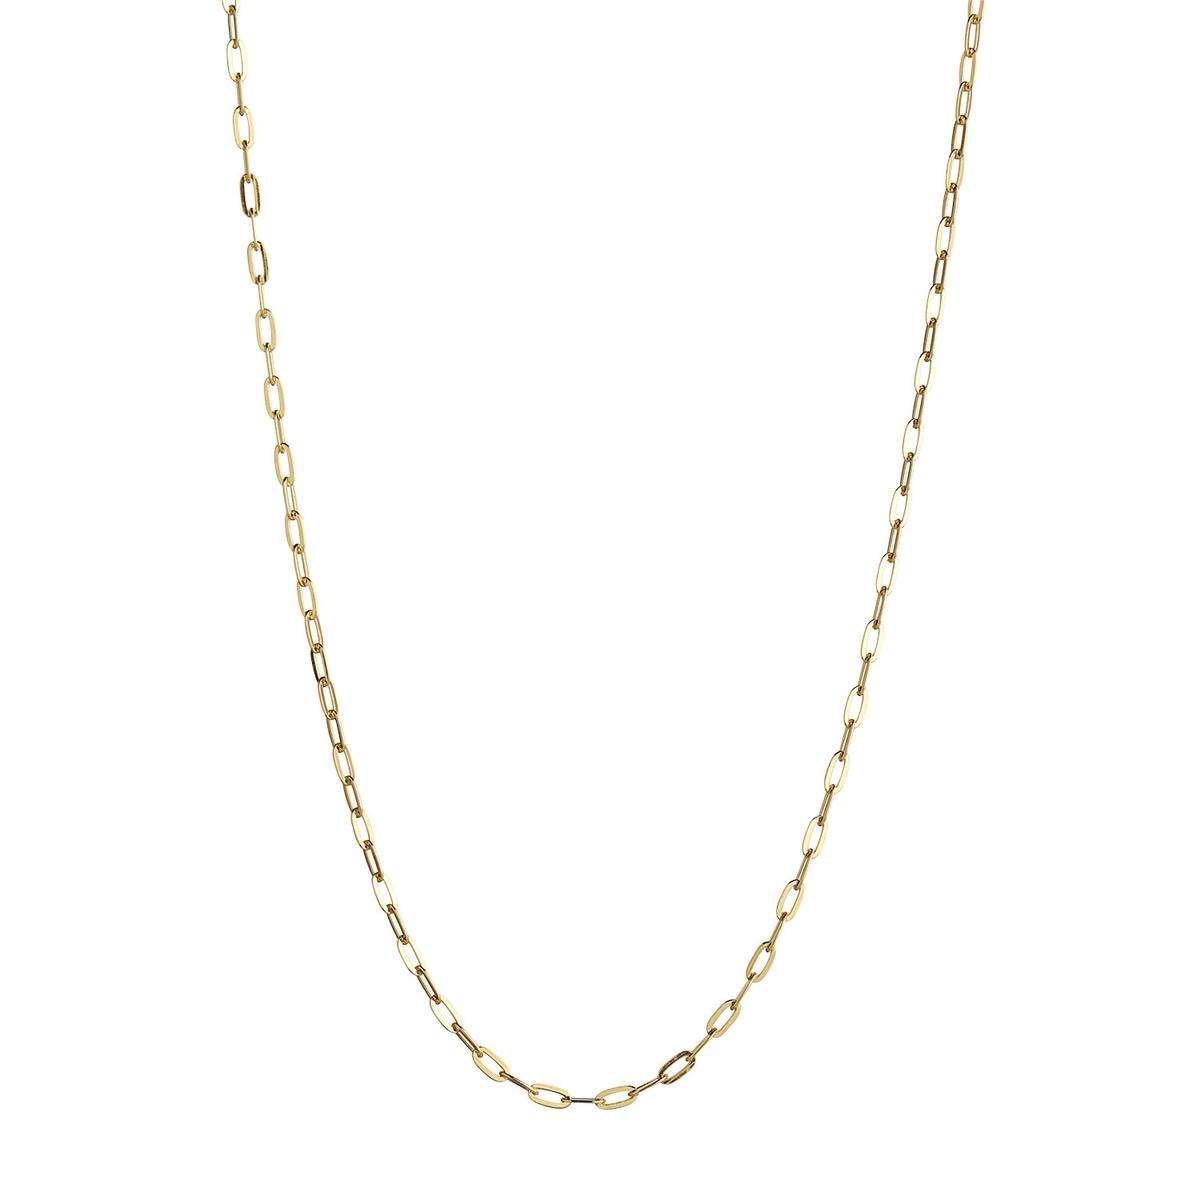 Stine A - Smykke Petit Chunky Pendant Chain Gold